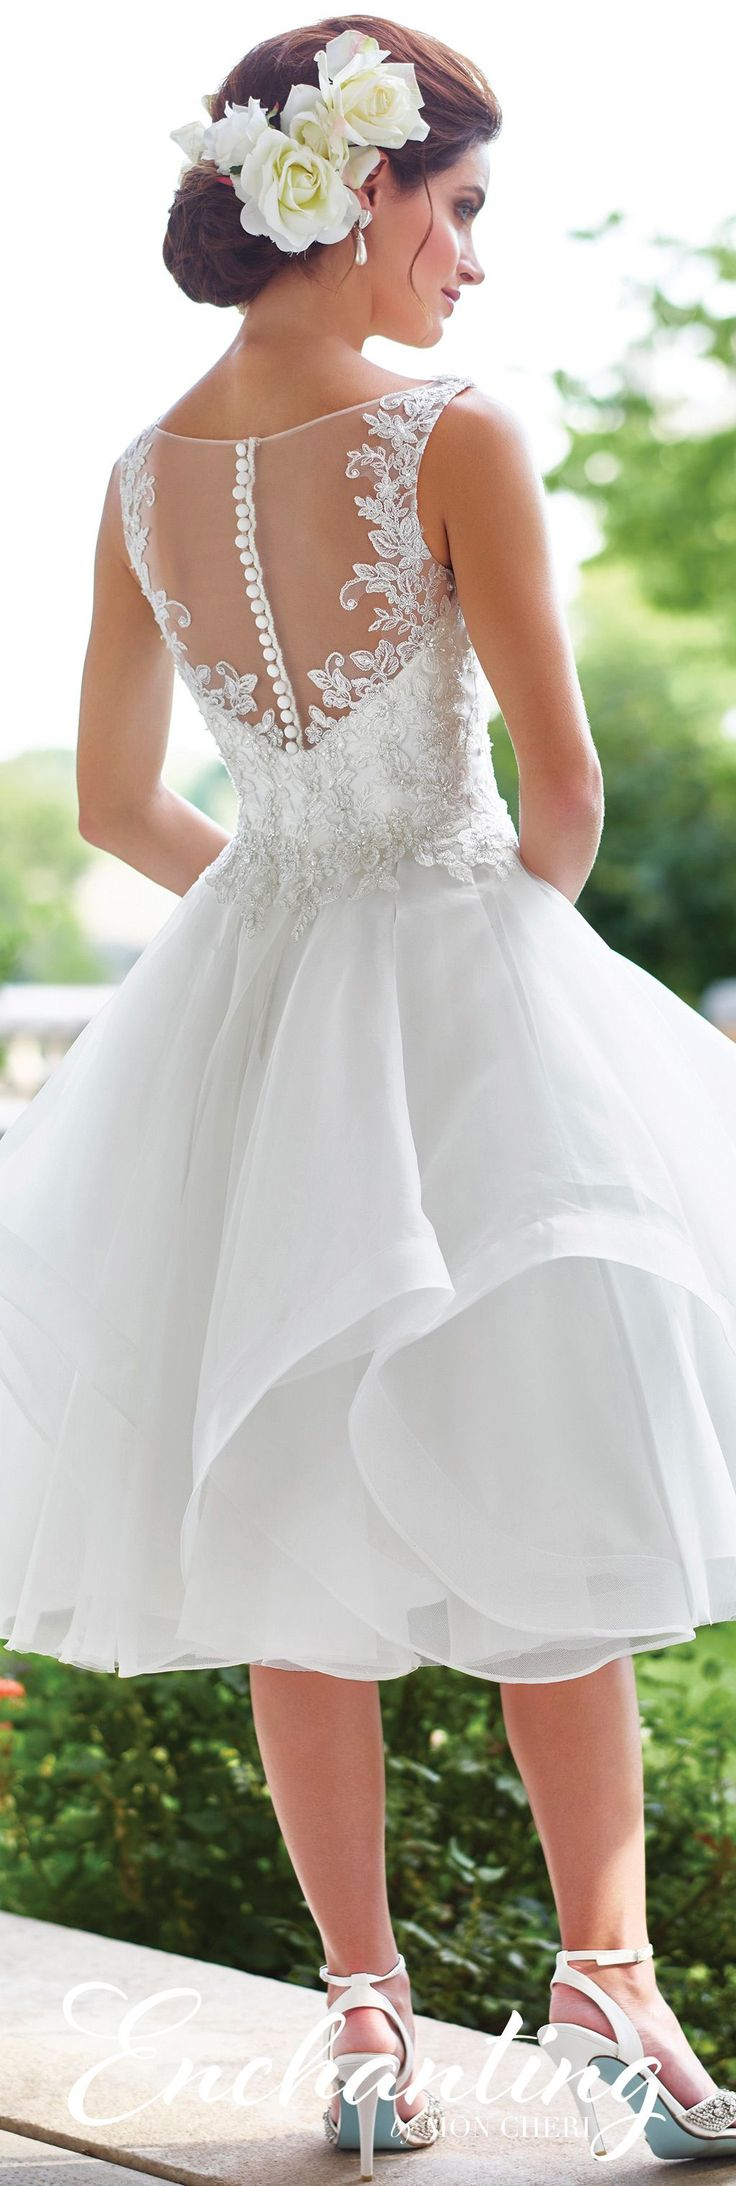 Best 25 Short wedding dresses ideas on Pinterest  Rehearsal dress Satin short dress and Short